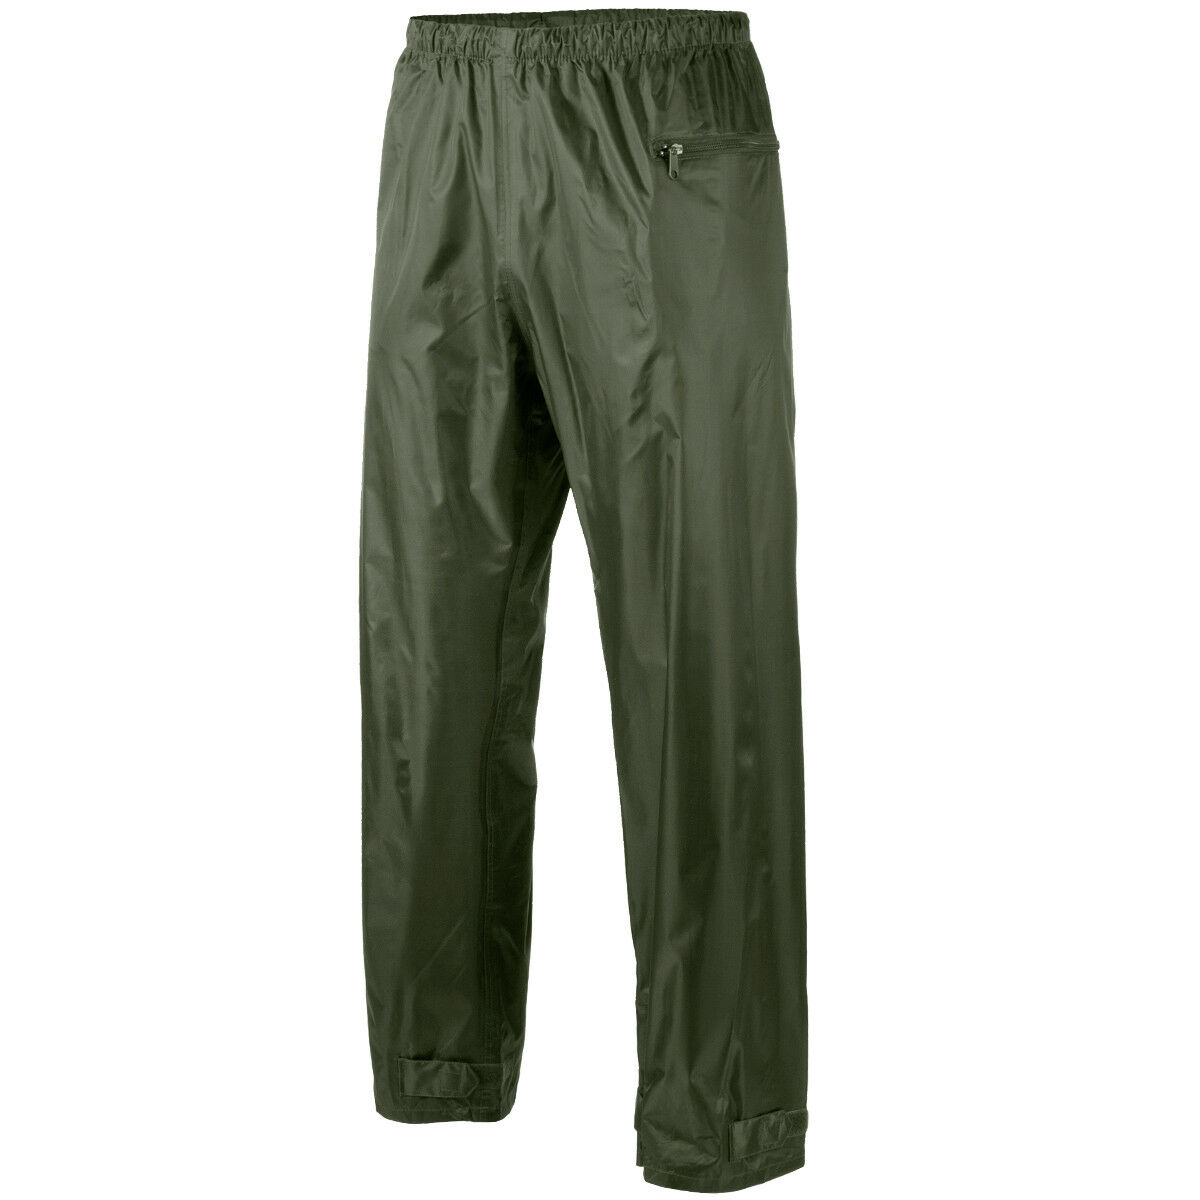 MFH Rain Pants Mens Waterproof Army Military Outdoor Fishing Trousers OD Green